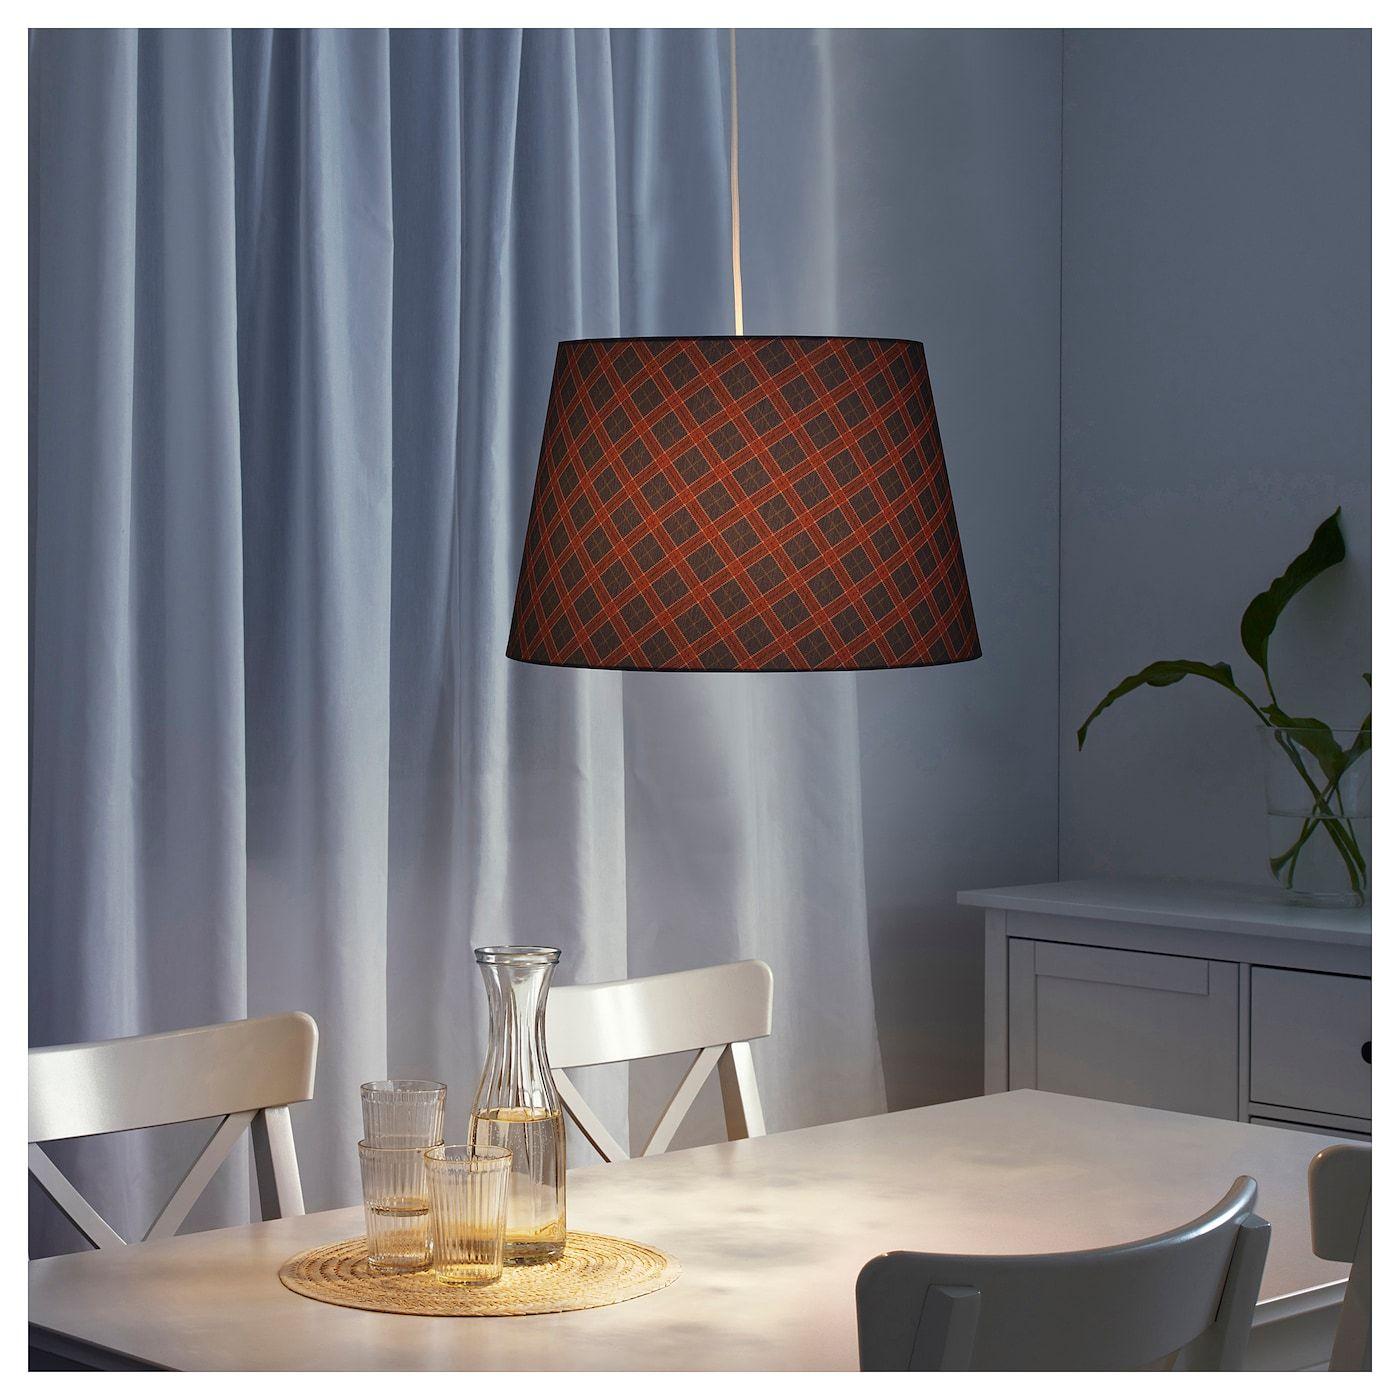 IKEA RYRA Lamp shade check red, blue Bedroom light